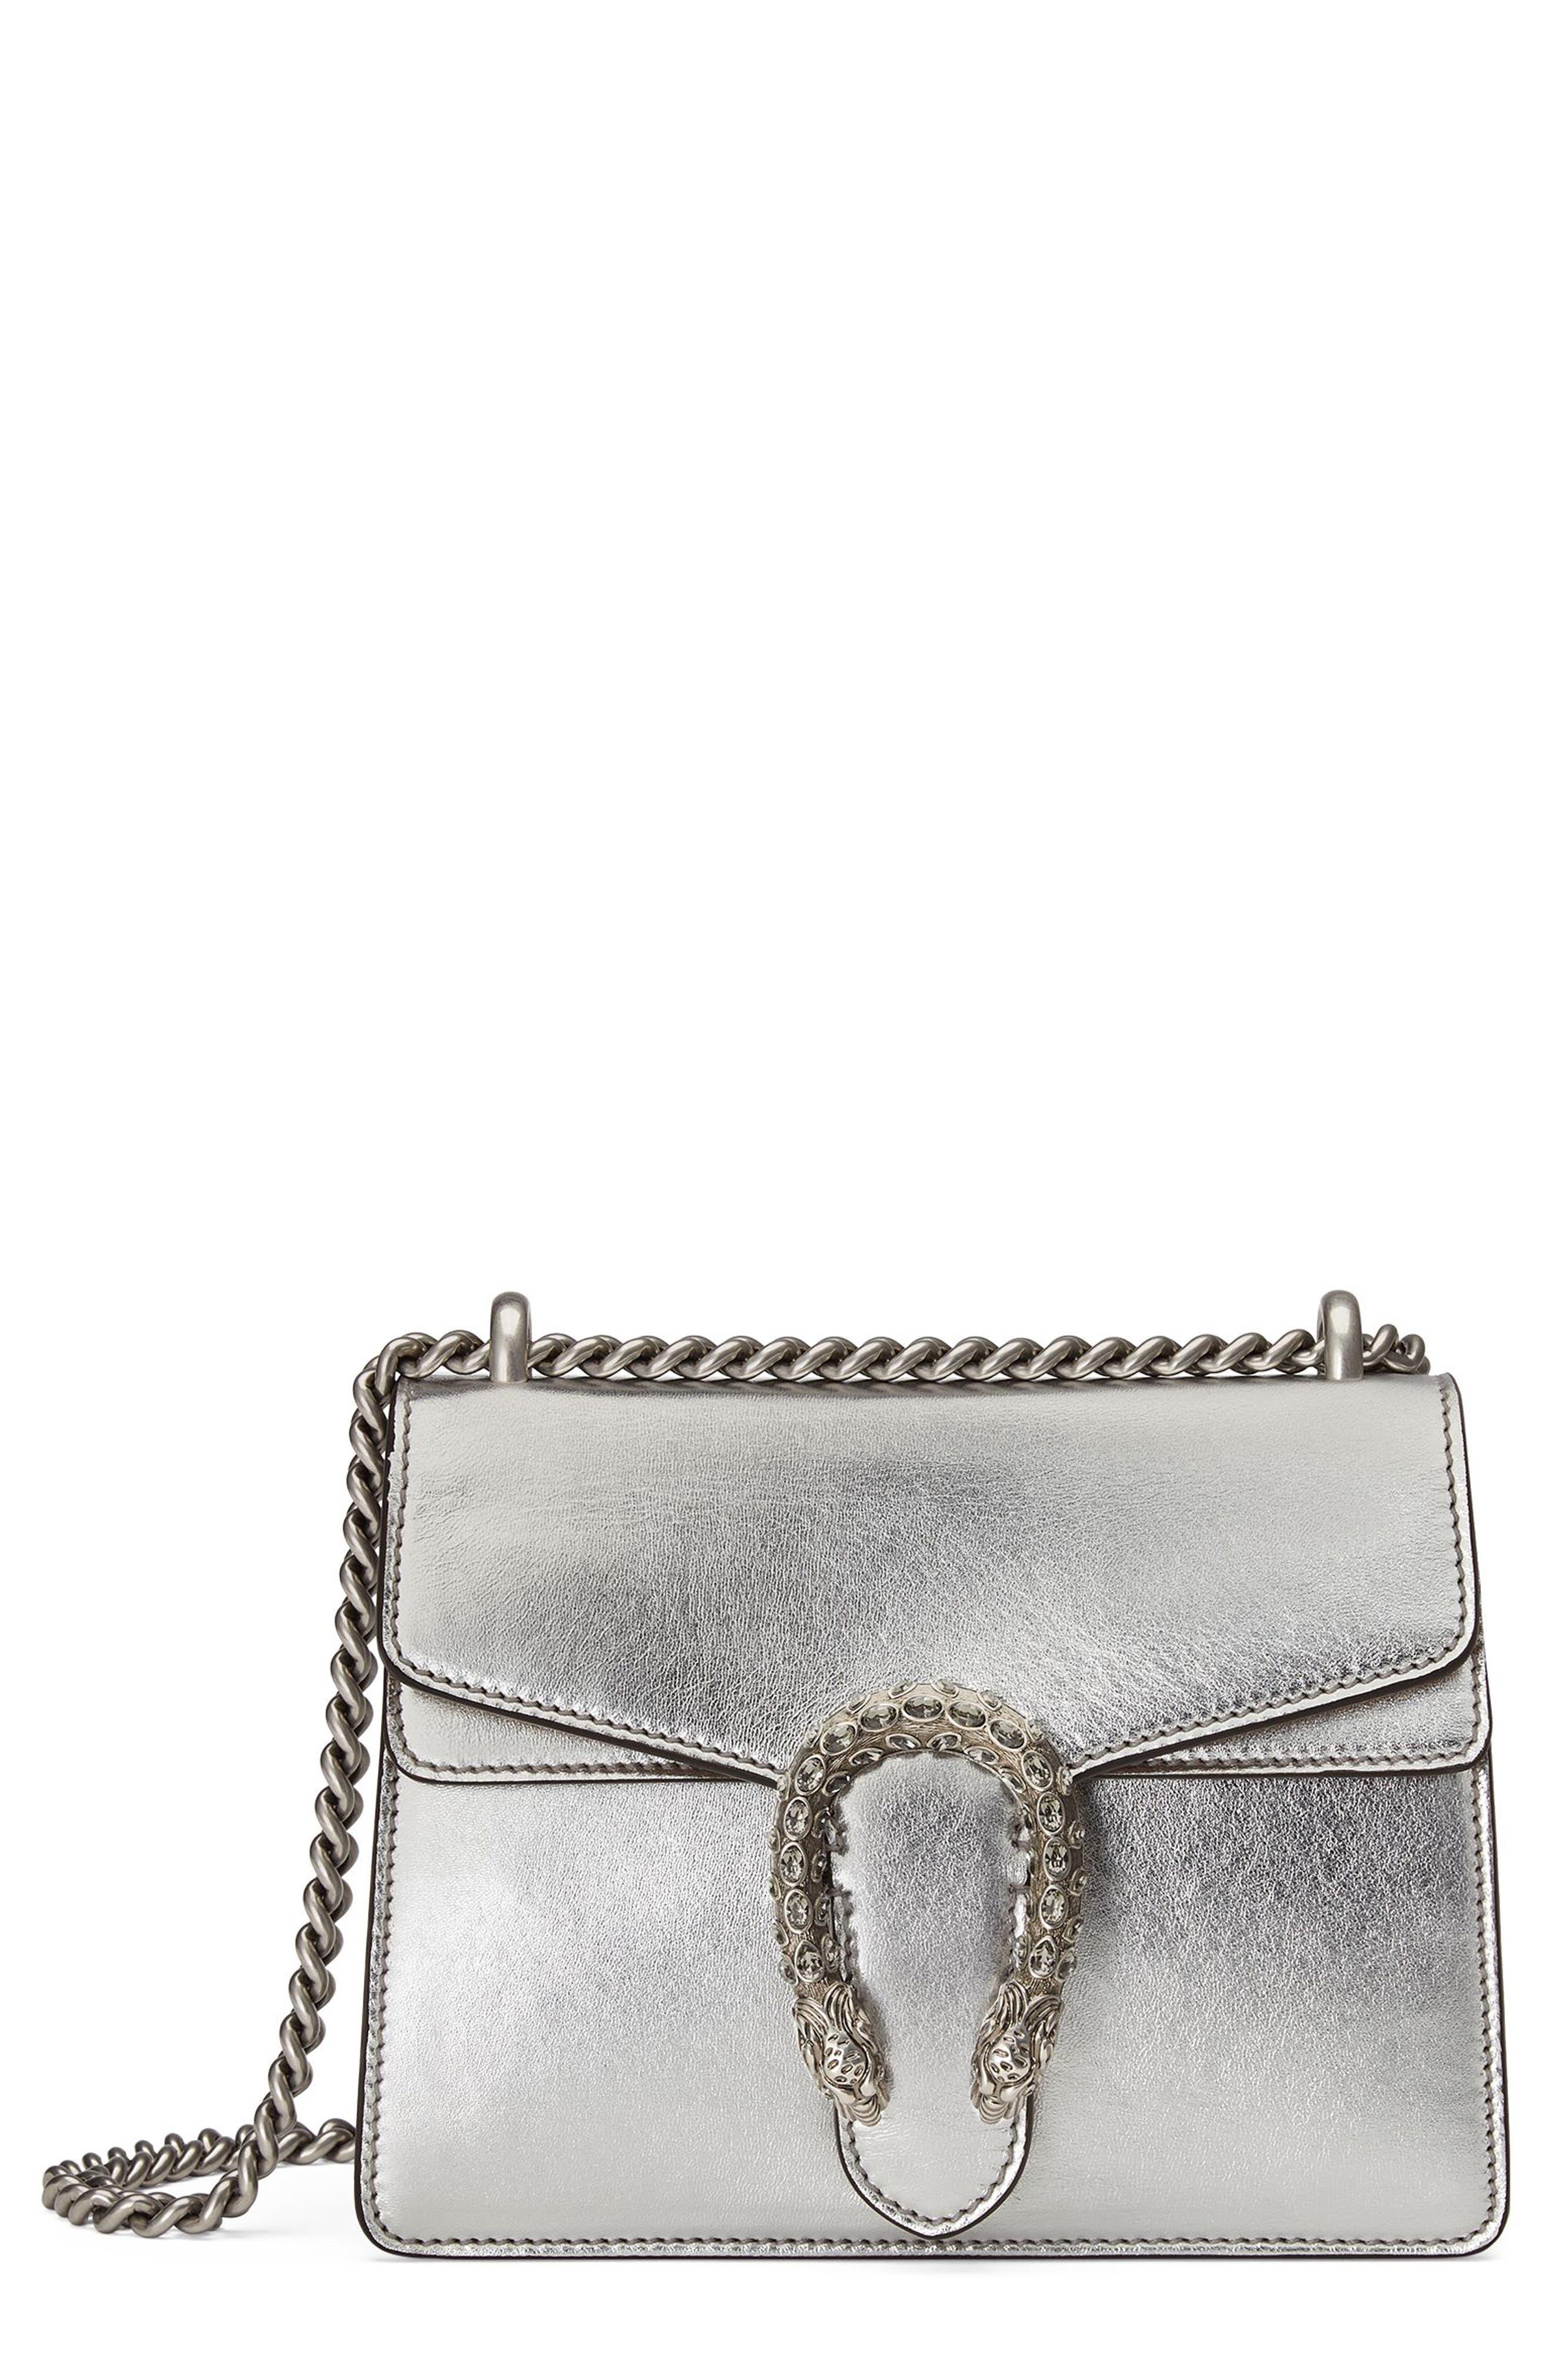 Main Image - Gucci Mini Dionysus Metallic Leather Shoulder Bag